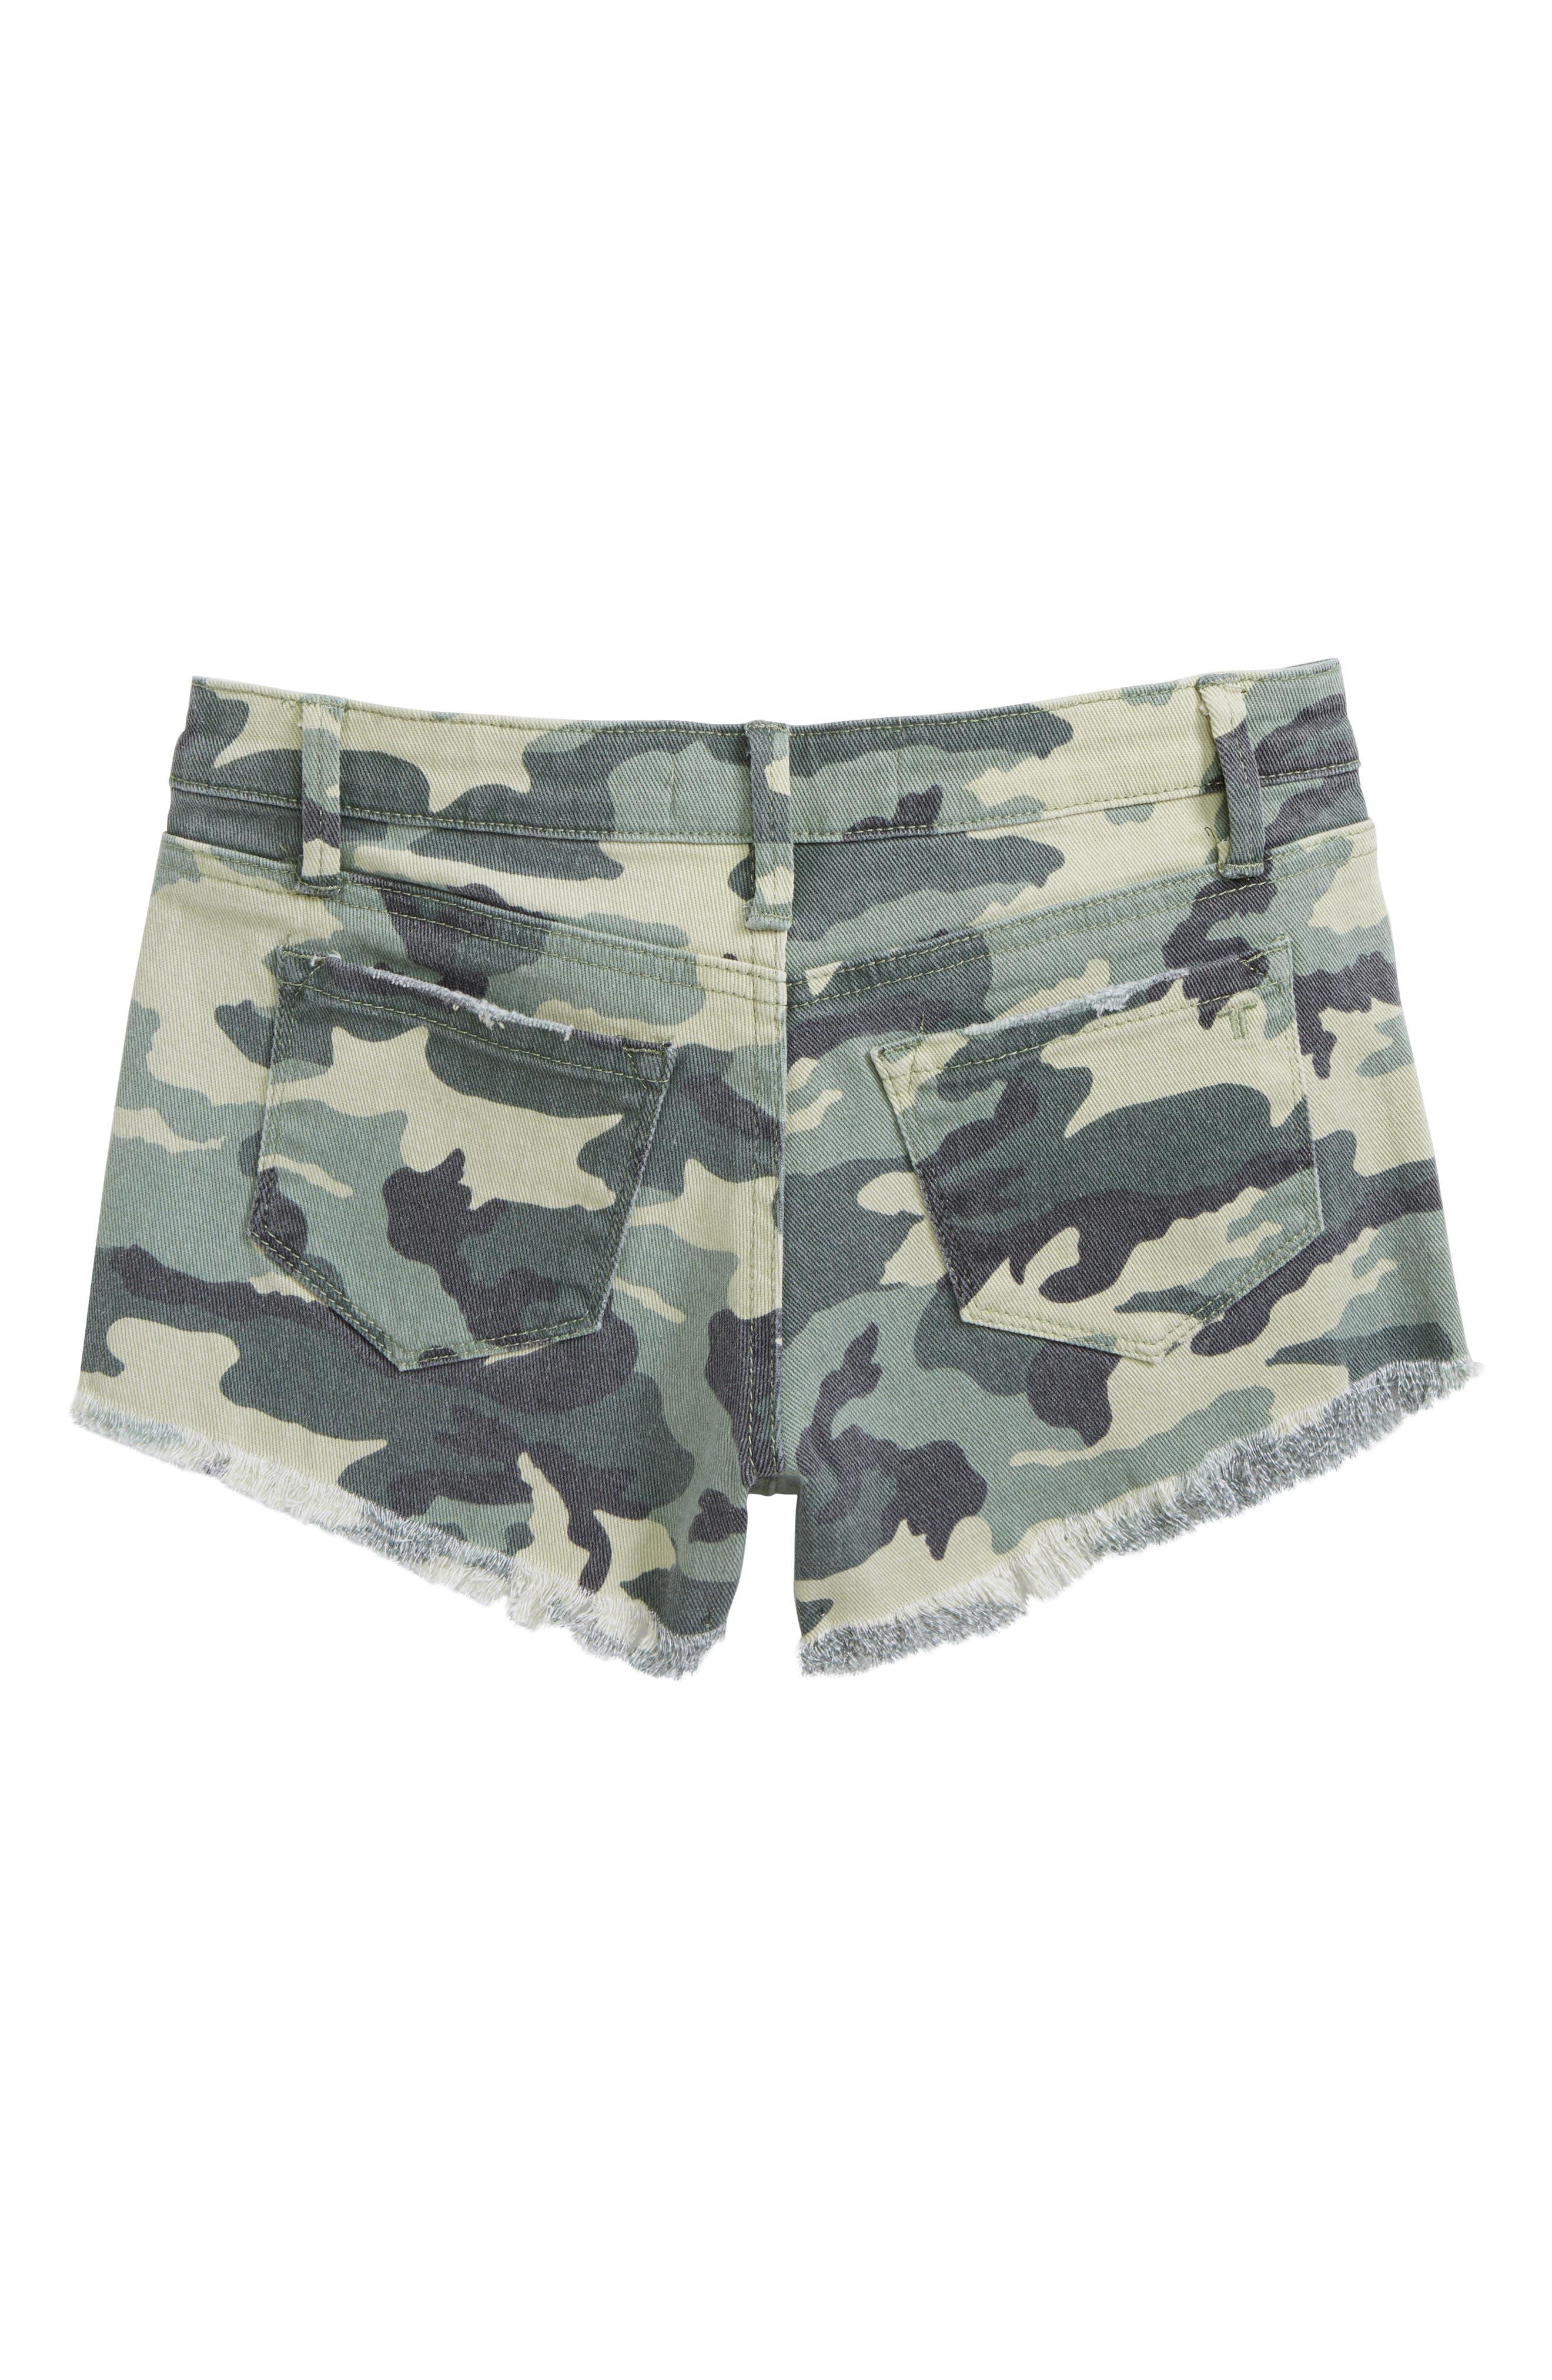 Camo Shorts,                             Alternate thumbnail 2, color,                             300